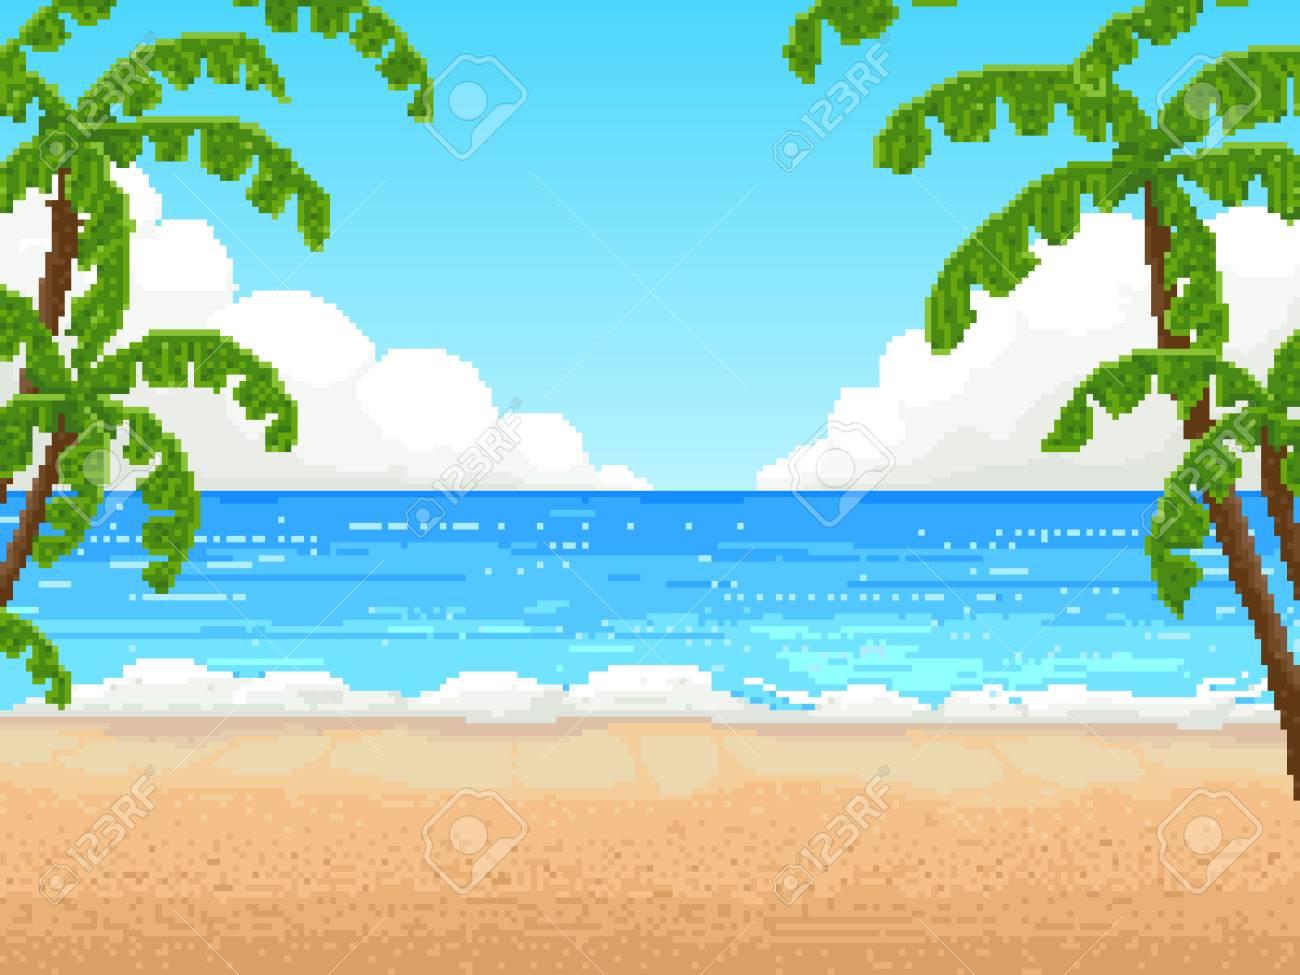 Retro pixel 8 bit background. beach, palm - 110251369